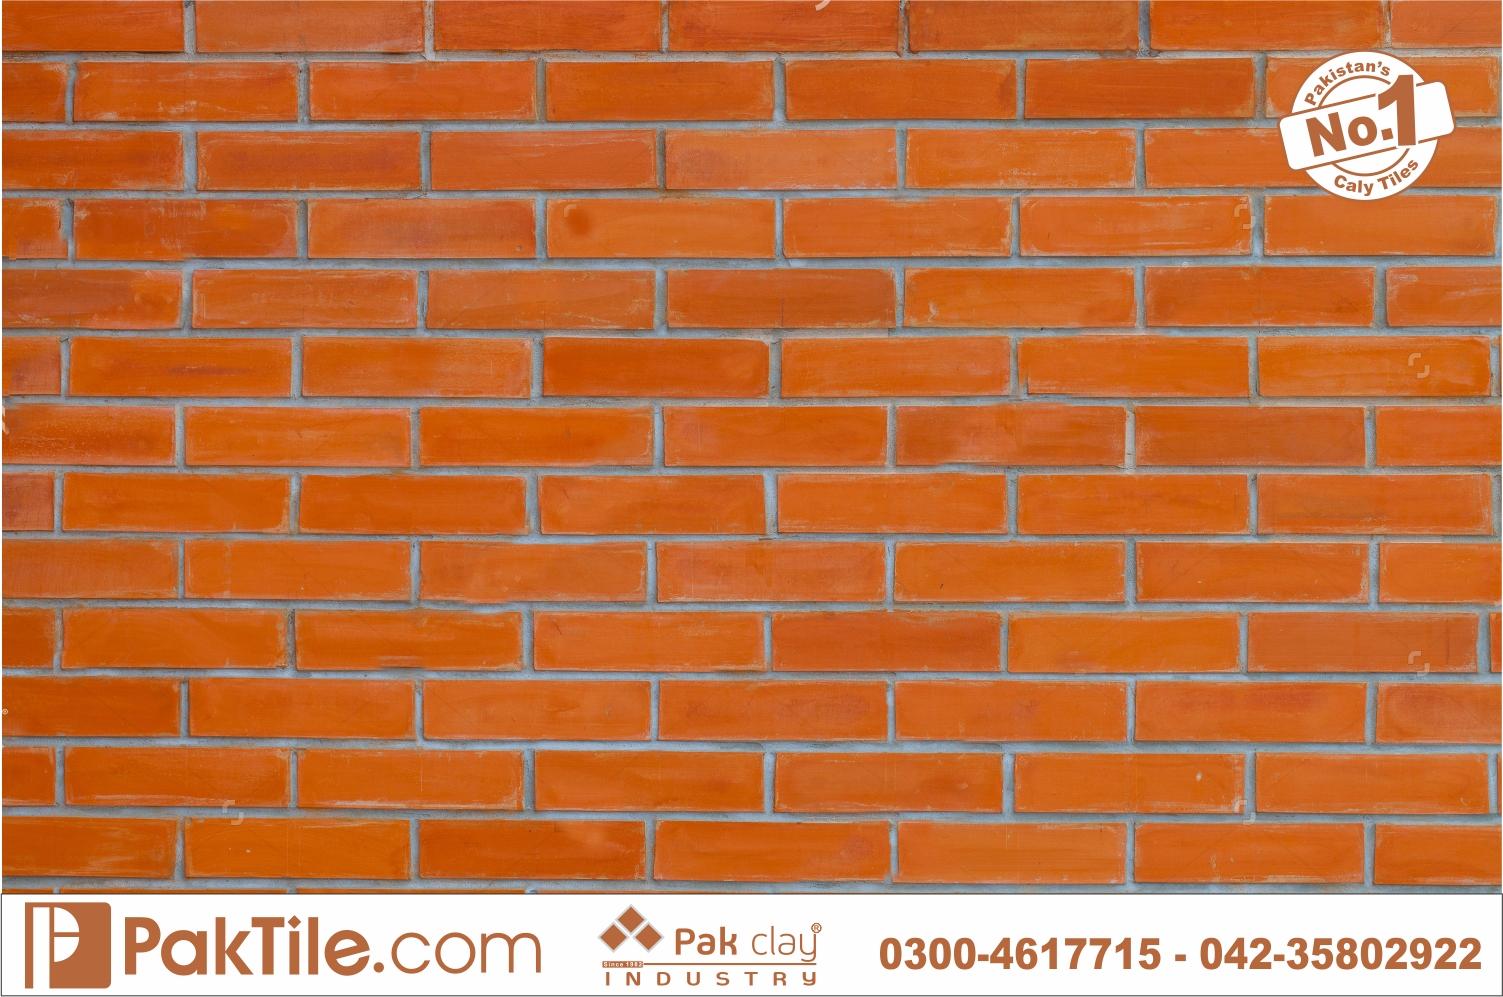 20 red bricks price in rawalpindi red bricks price in faisalabad images